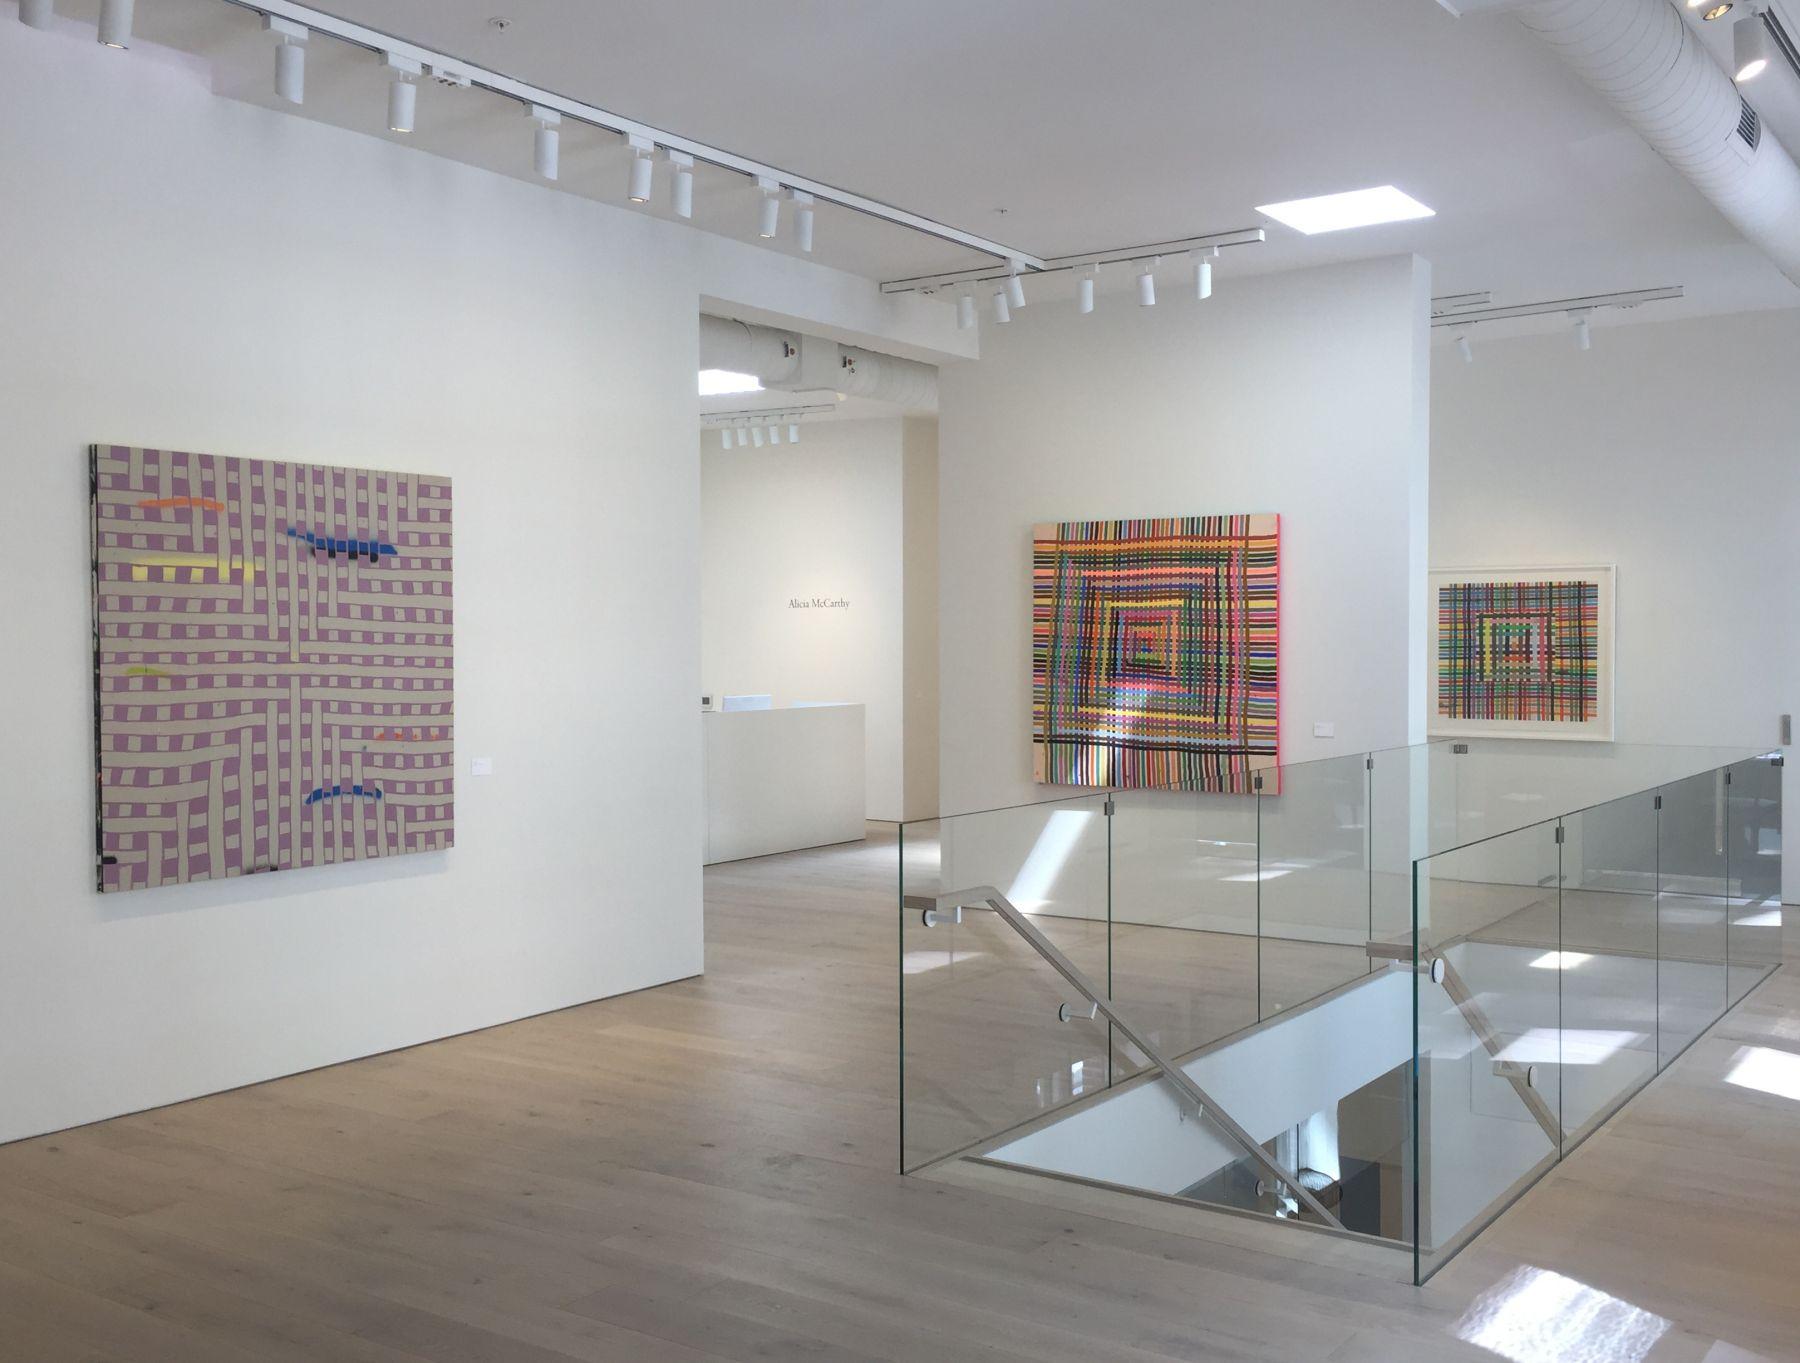 Alicia McCarthy at Berggruen Gallery, March 16 - April 22, 2017